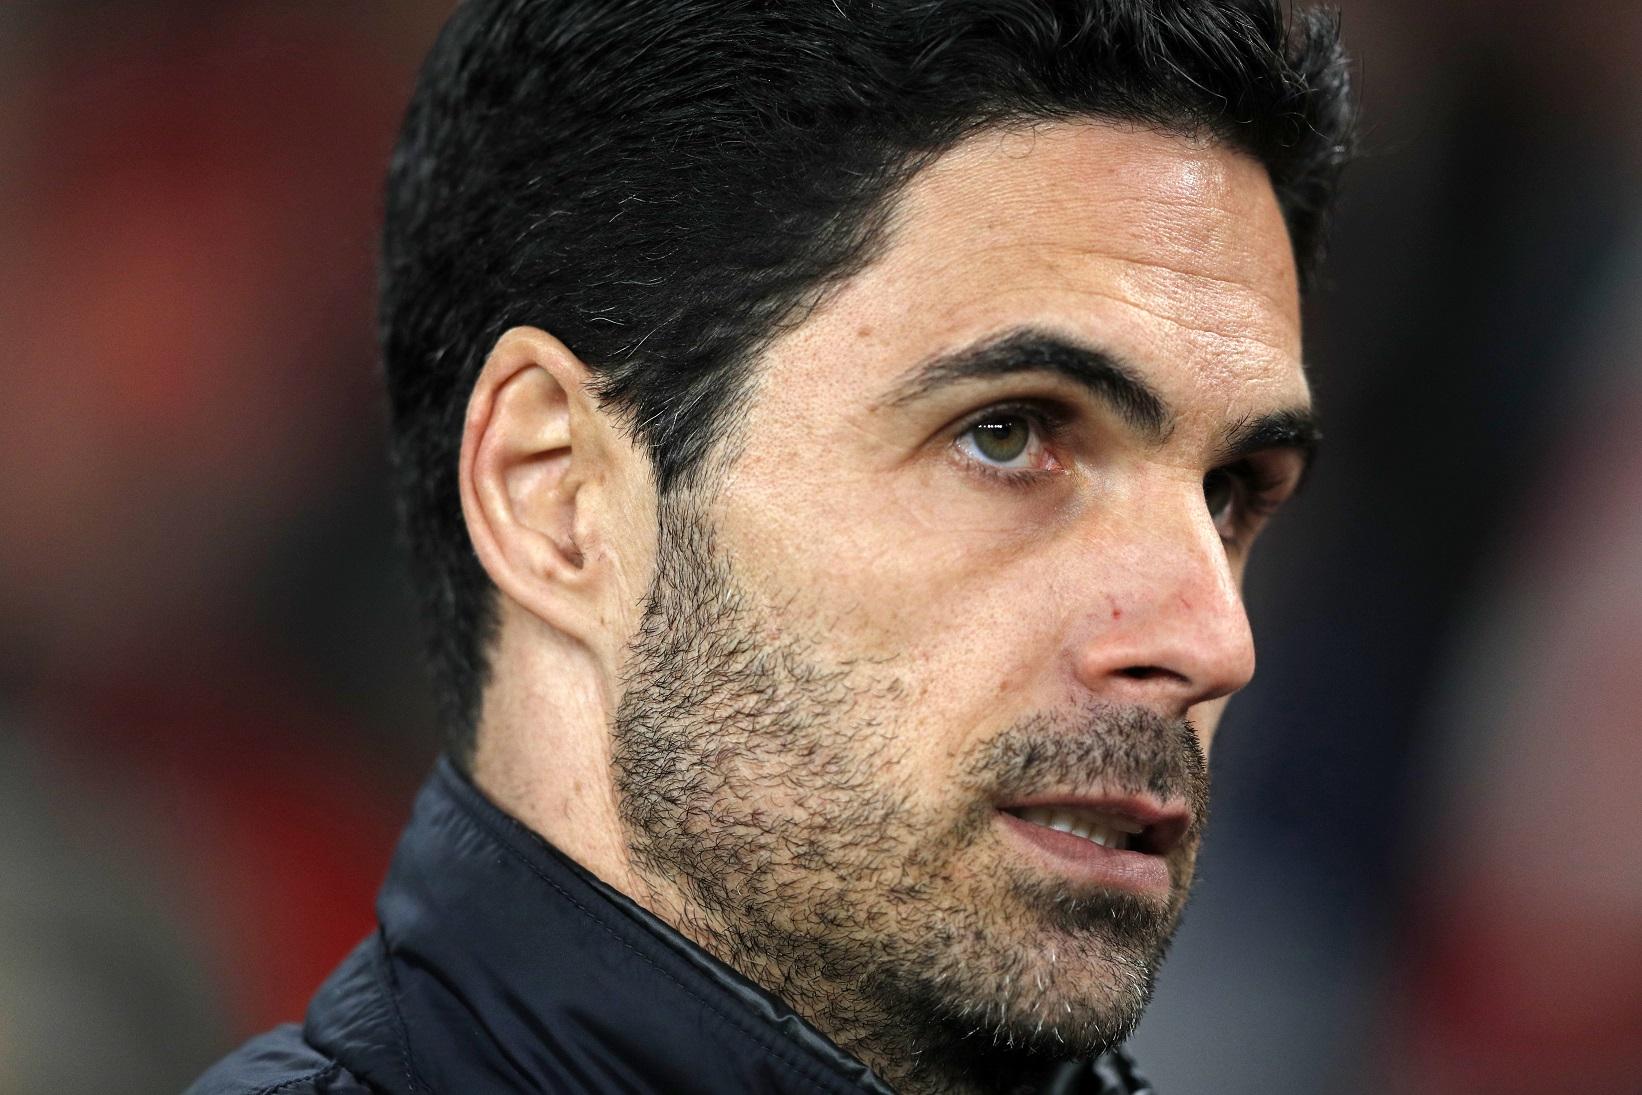 Arsenal manager Arteta tests positive for coronavirus